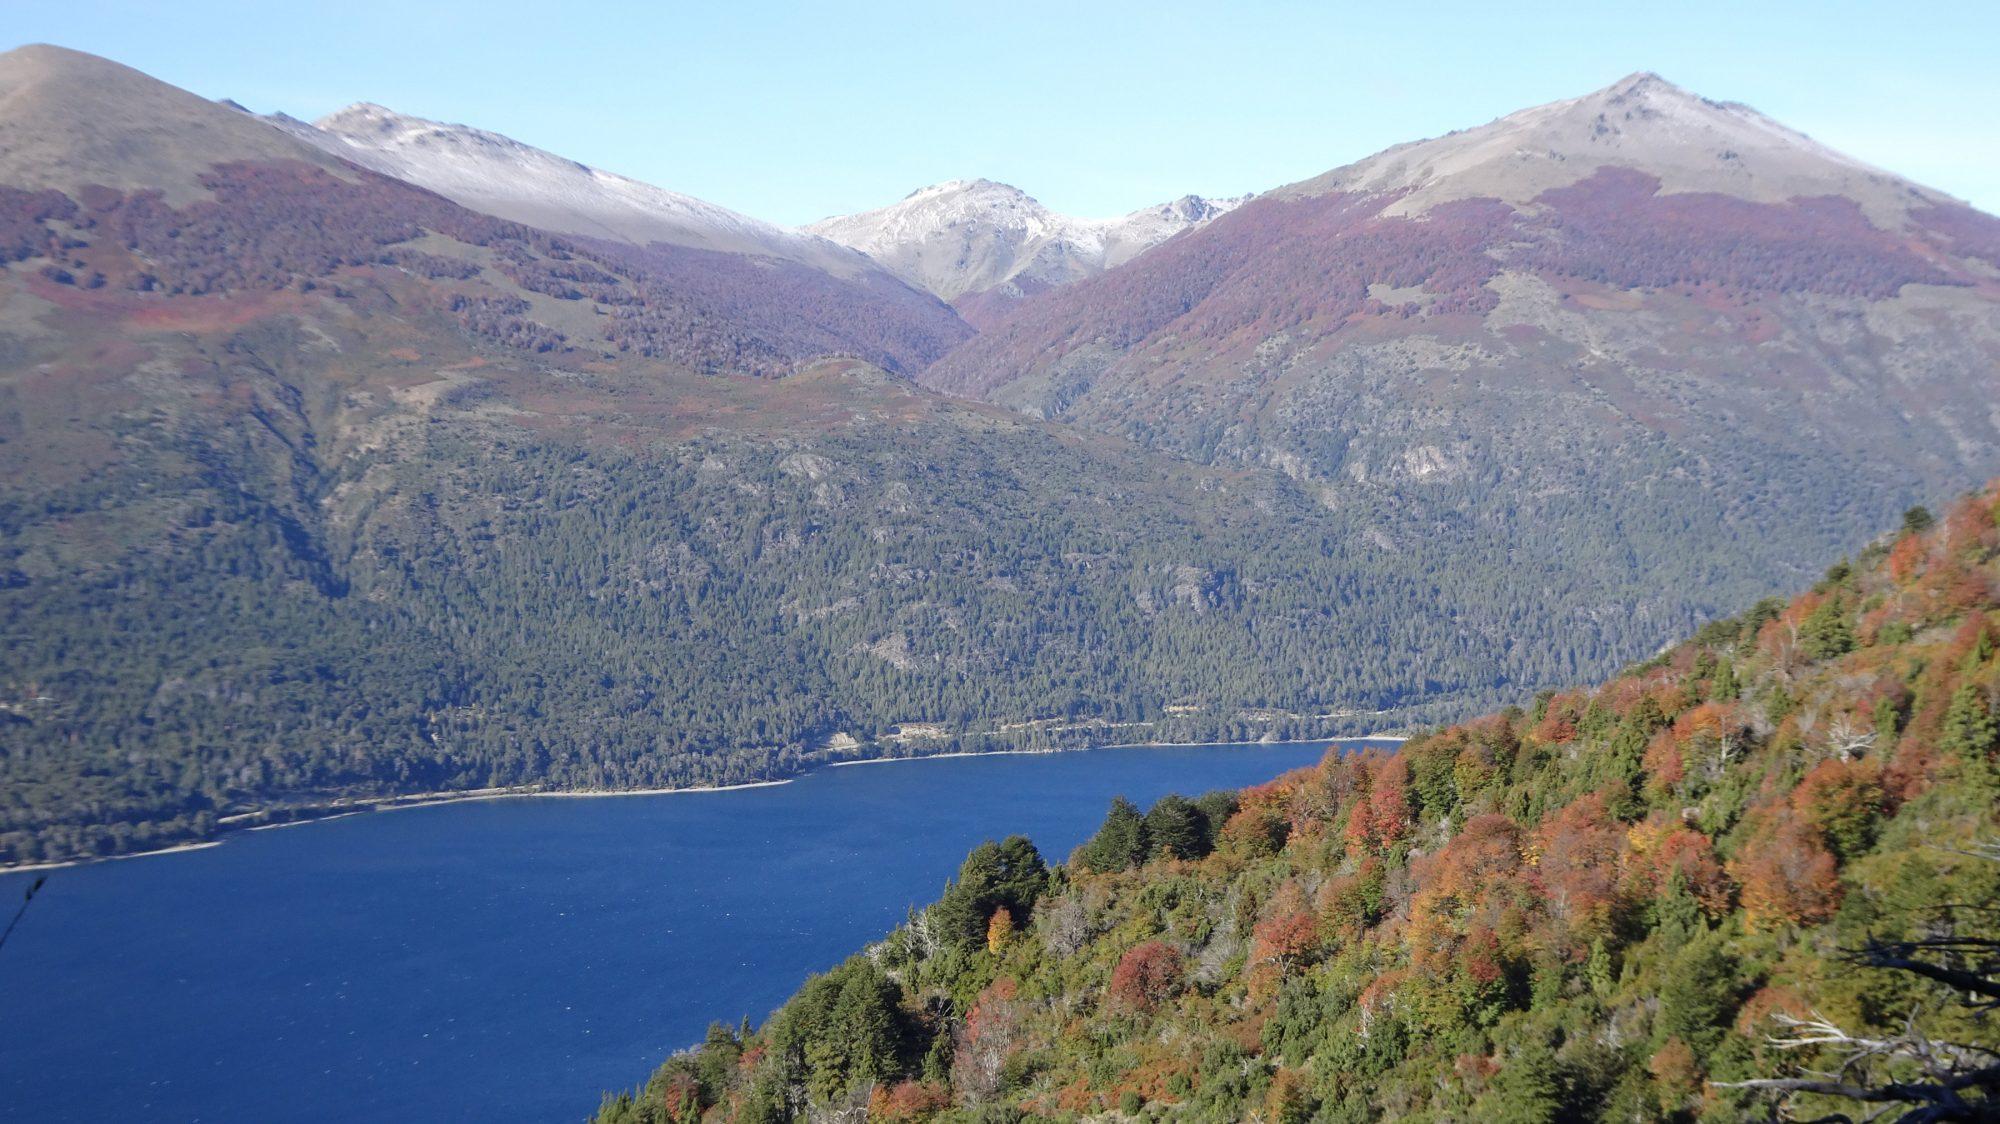 Fjella Bariloche Nahuel-Huapi Traverse Wanderung Wanderroute Catedral Refugio Frey Jacob Patagonien Argentinische Schweiz